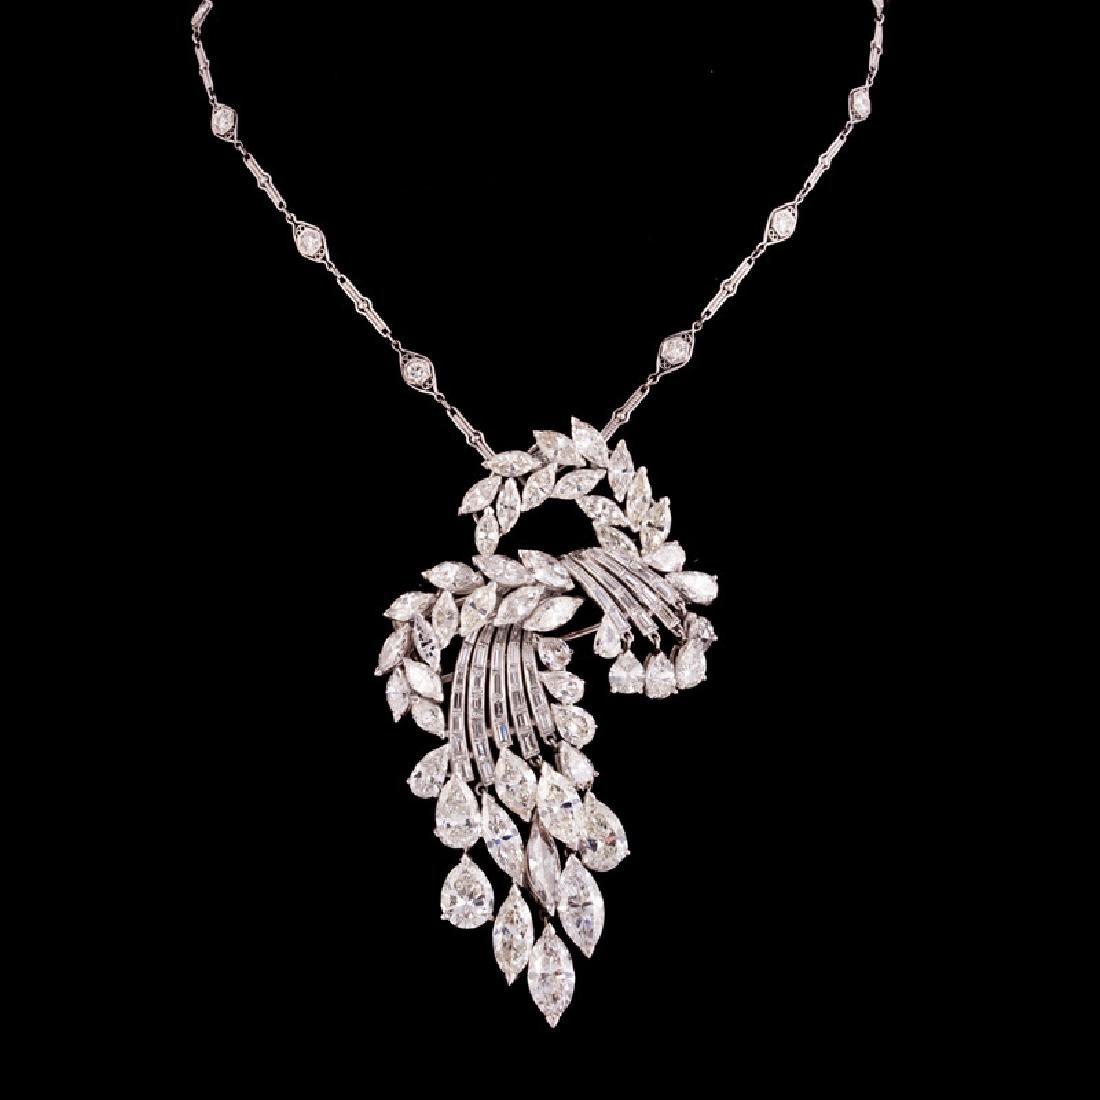 DIAMOND CASCADING STYLE PIN / NECKLACE